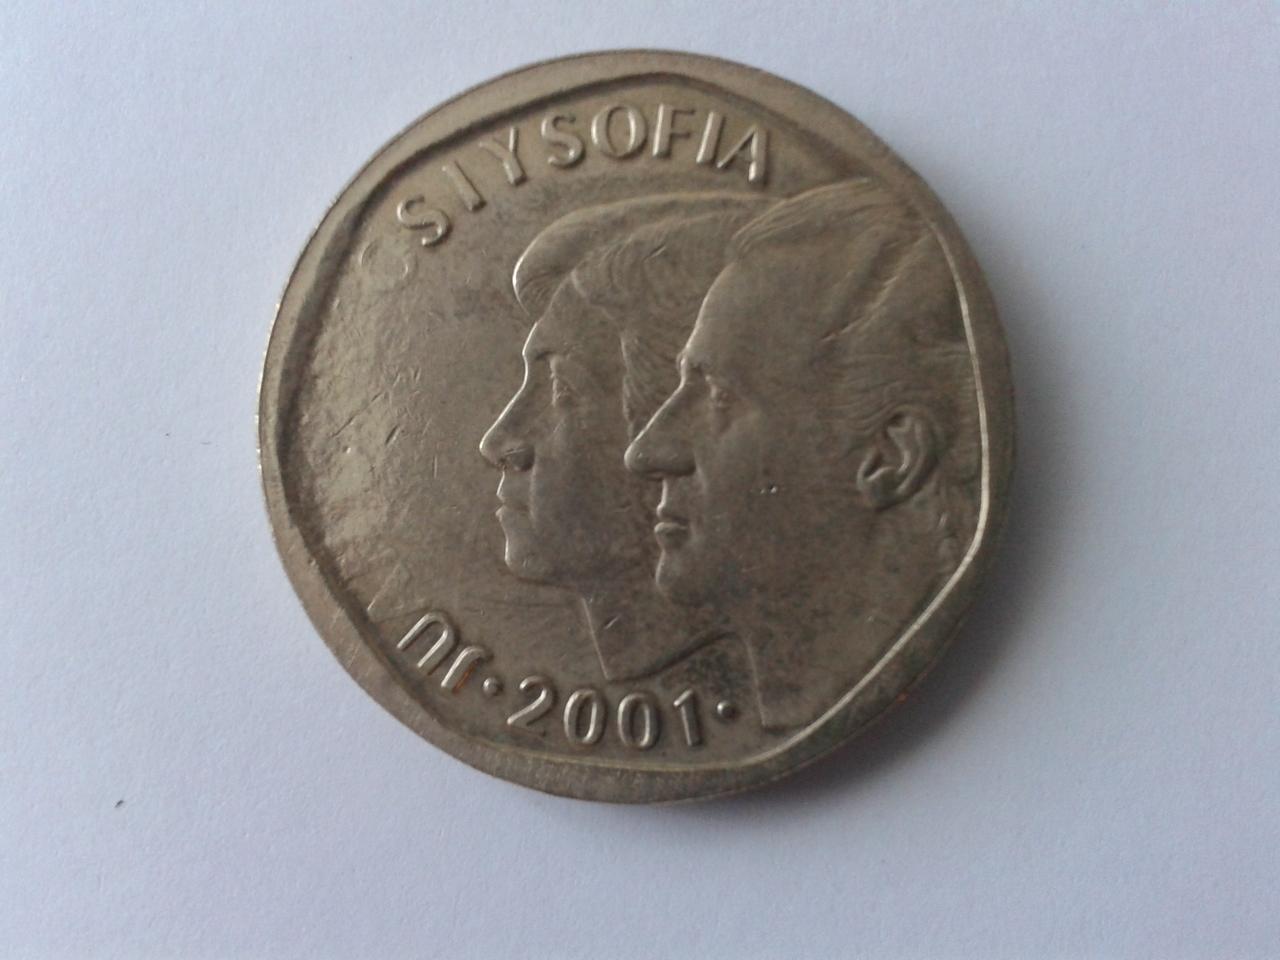 500 pesetas 2001 - Variante 20141101_153937